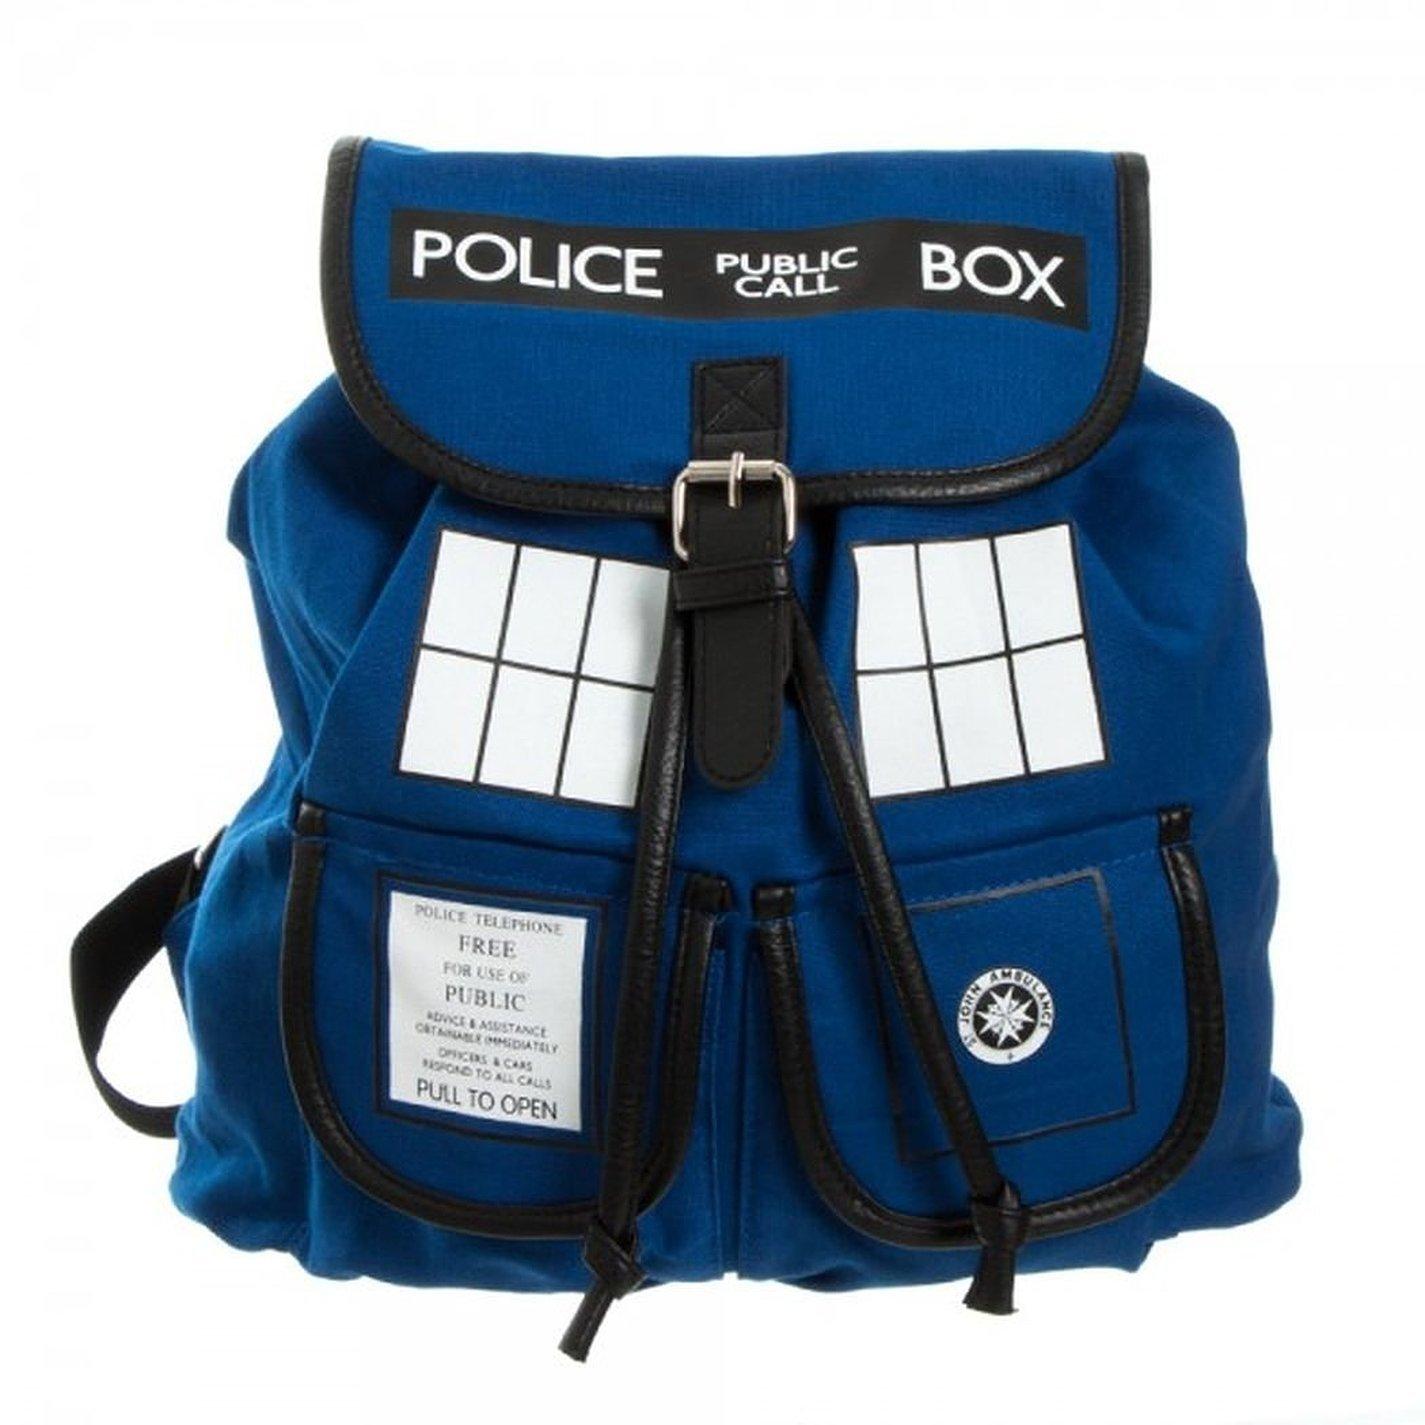 Doctor Who school supplies TARDIS Police Box Blue KNAPSACK